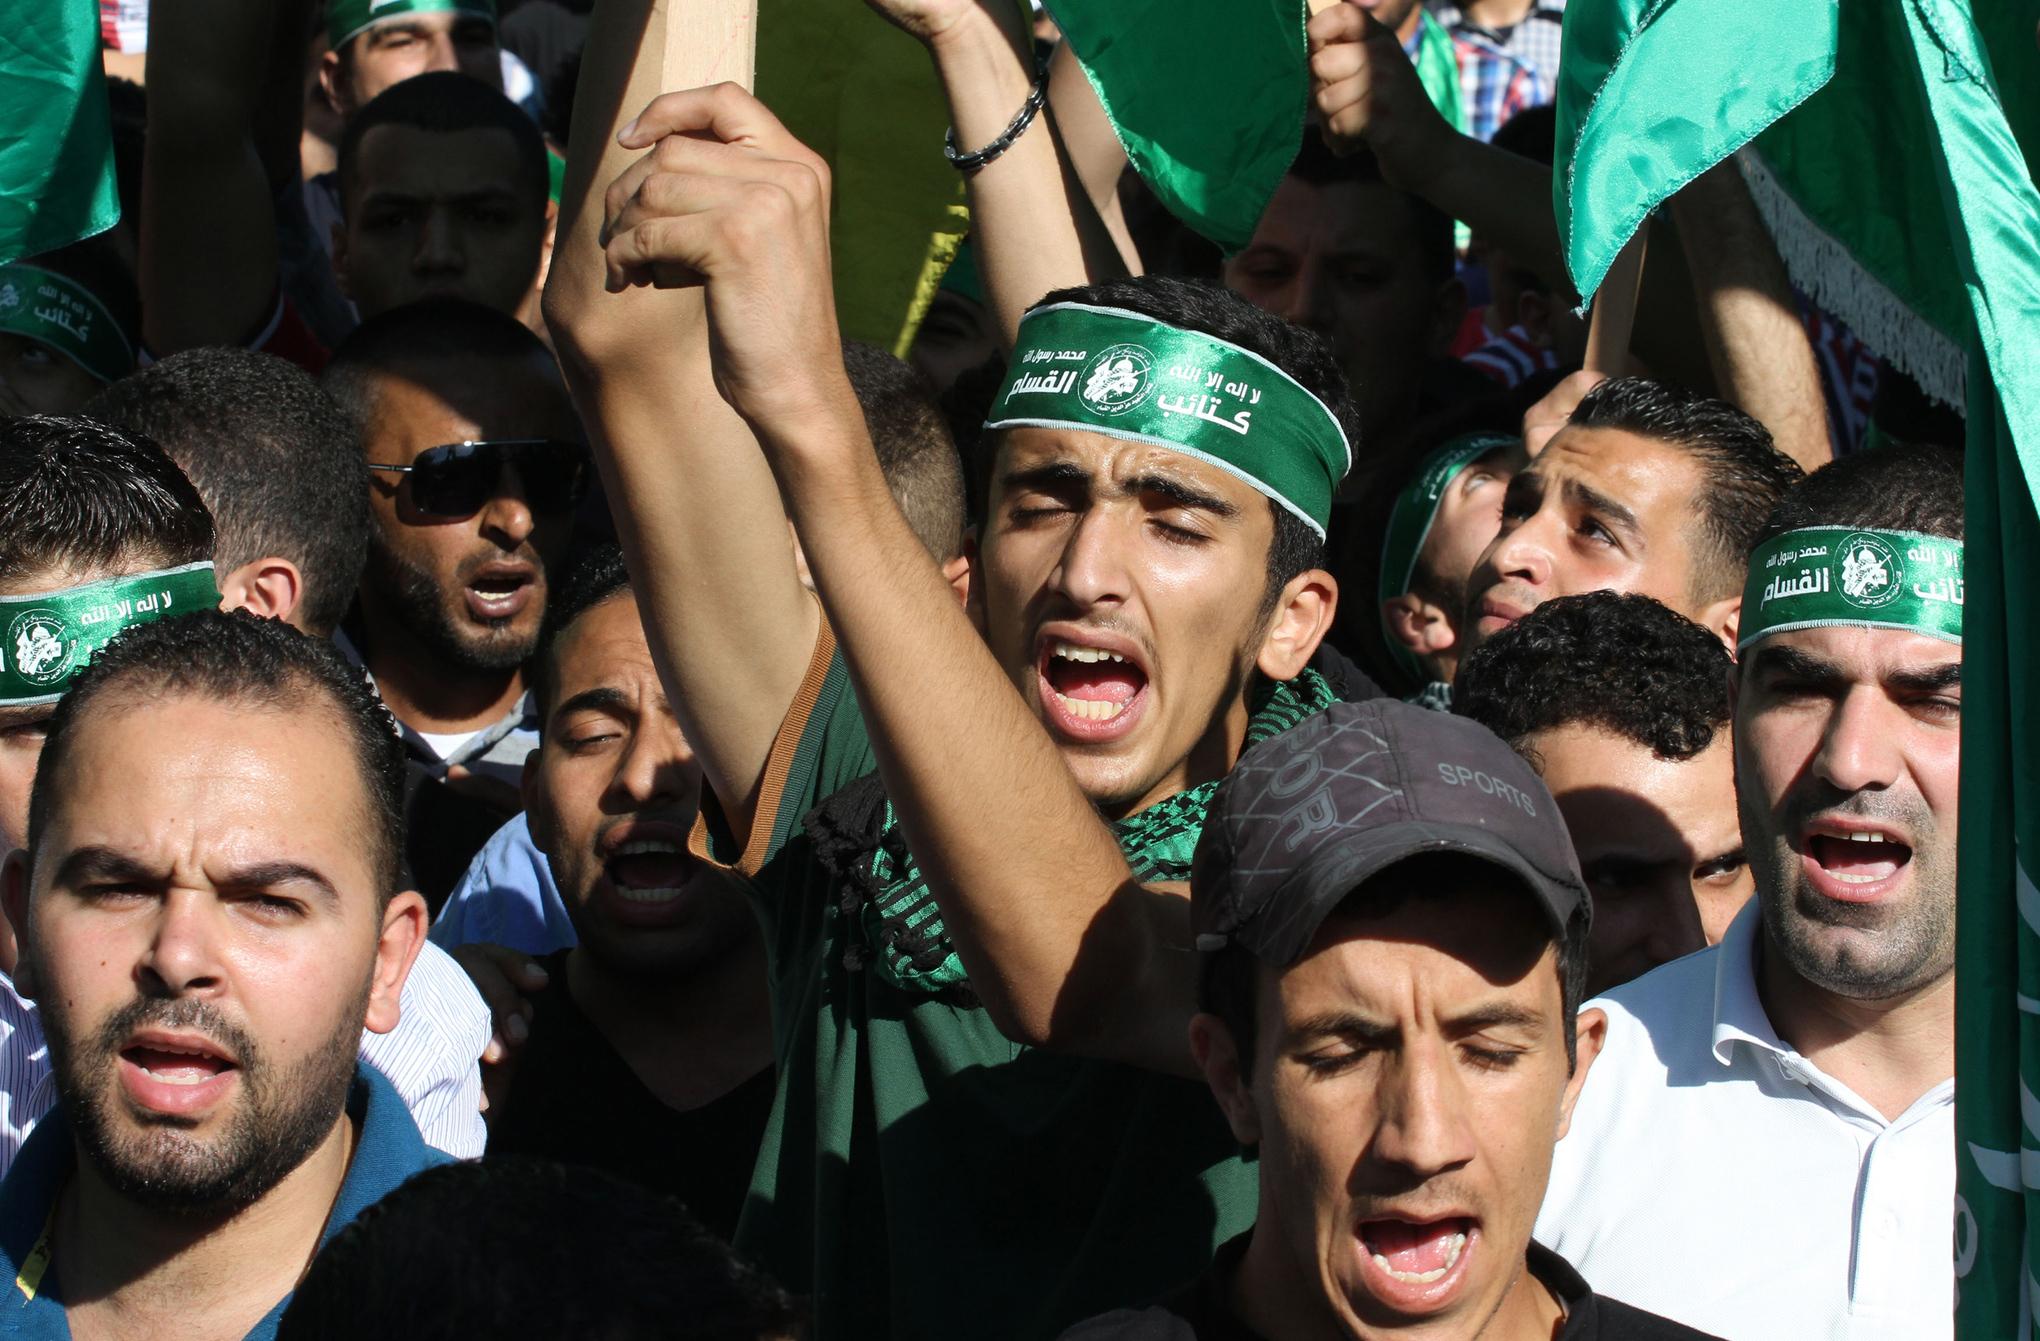 Hamas_rally_nablus